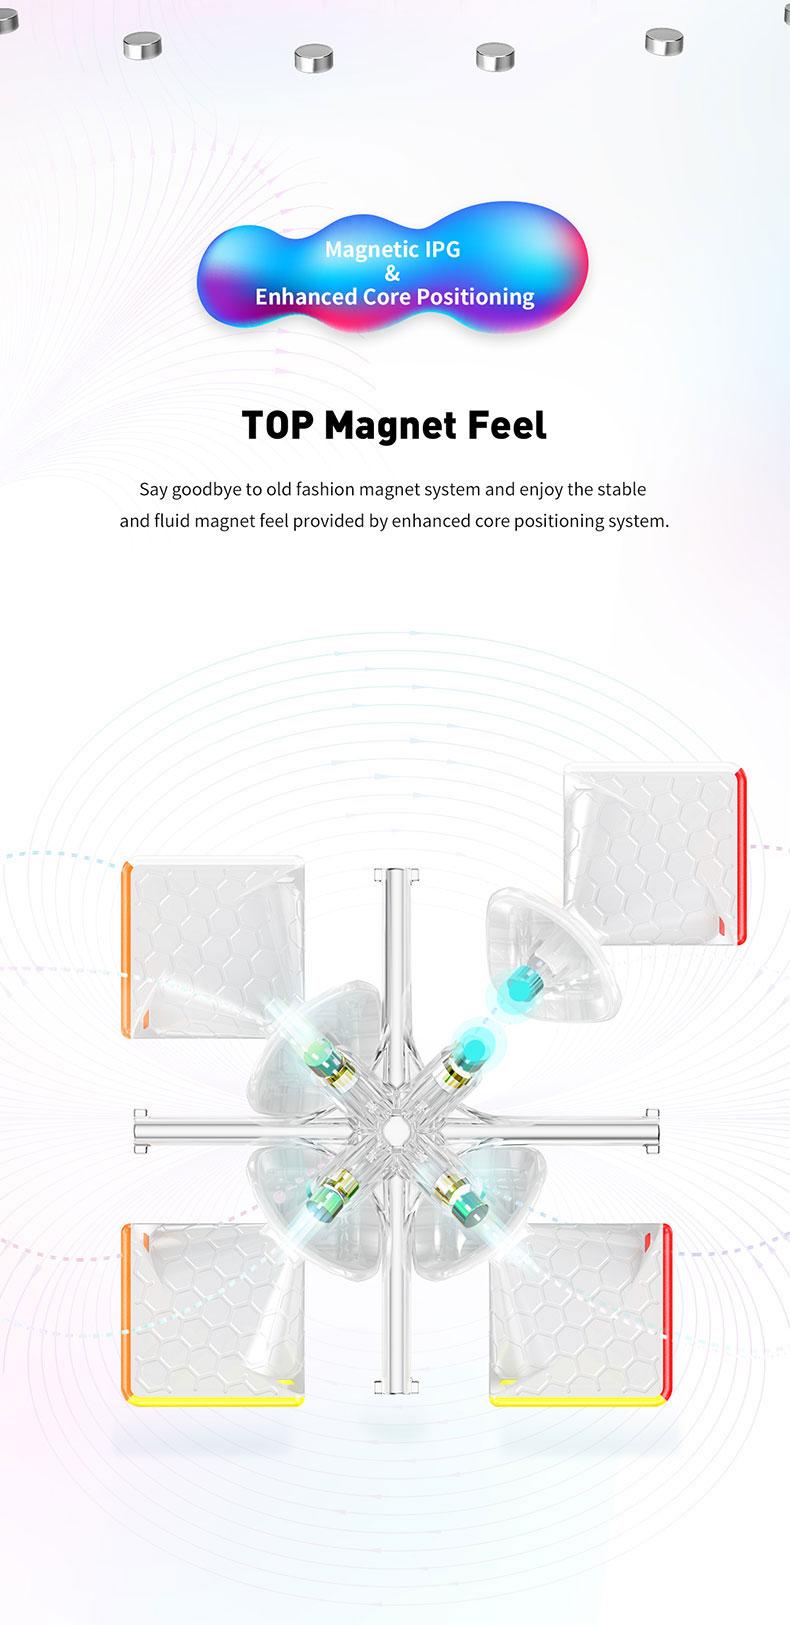 gan-11-m-duo-banner-5-magnets